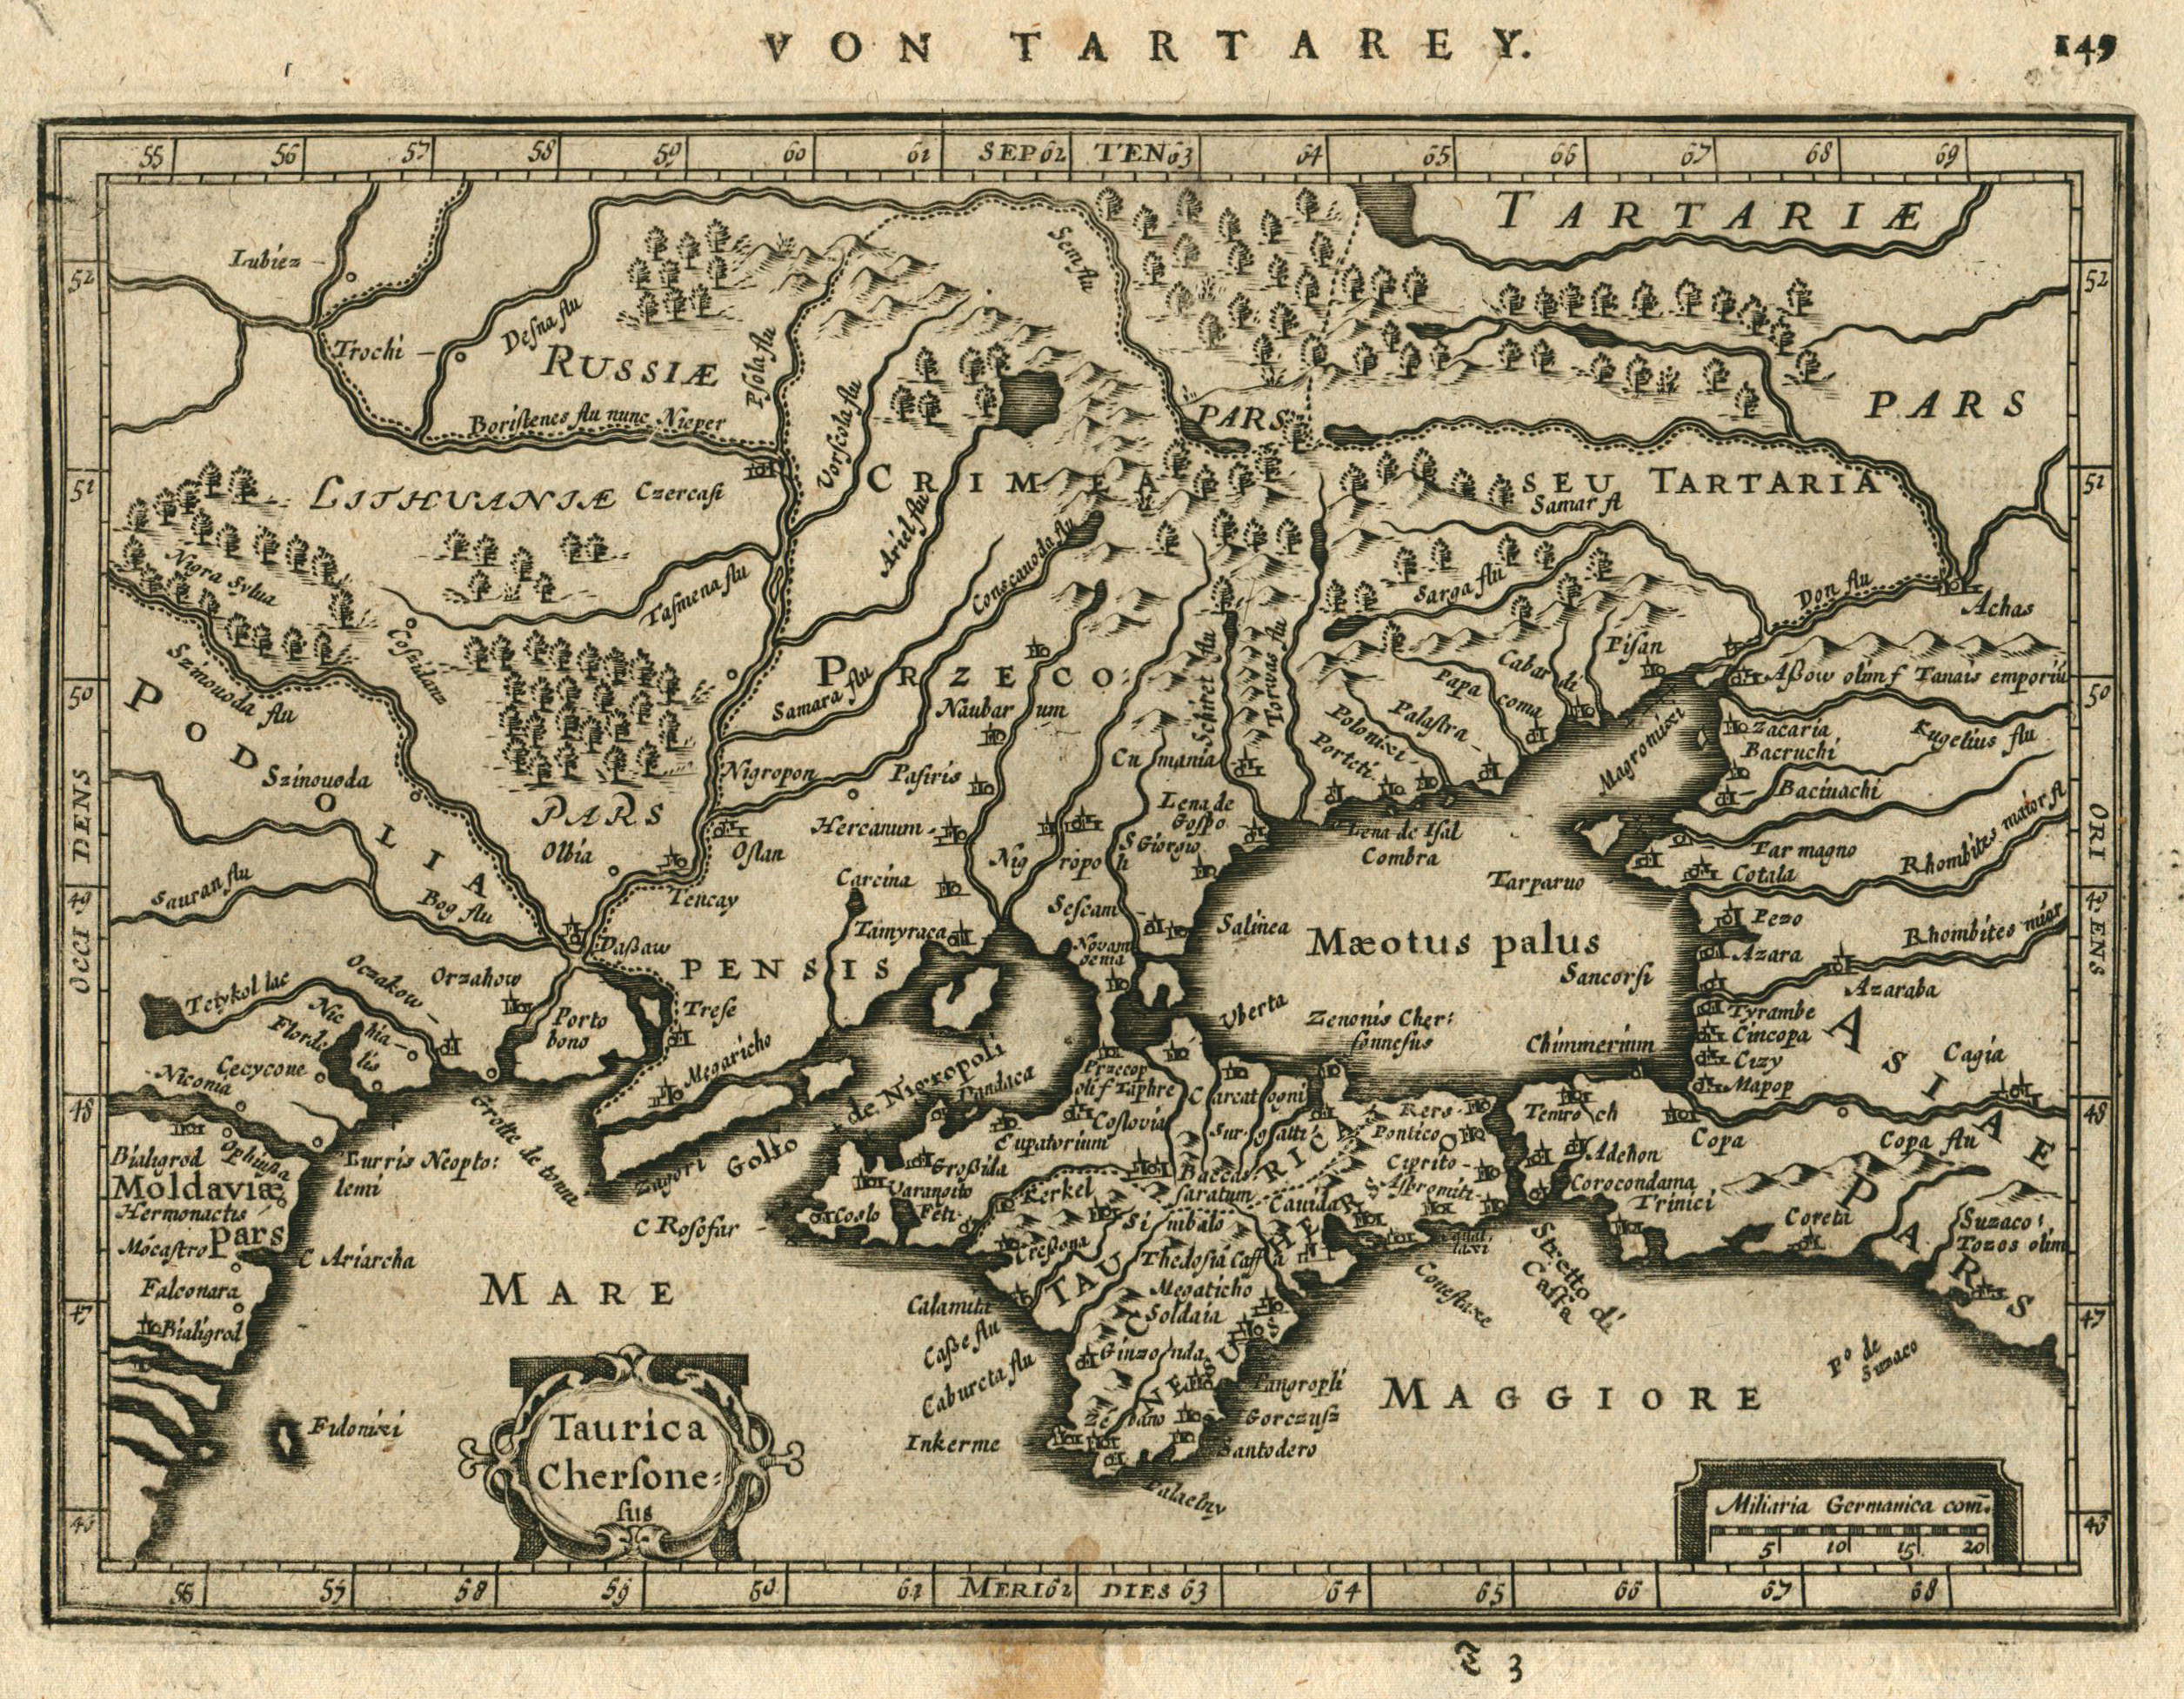 Kst.- Karte, b. Janssonius aus Atlas Minor,: Ukraine: